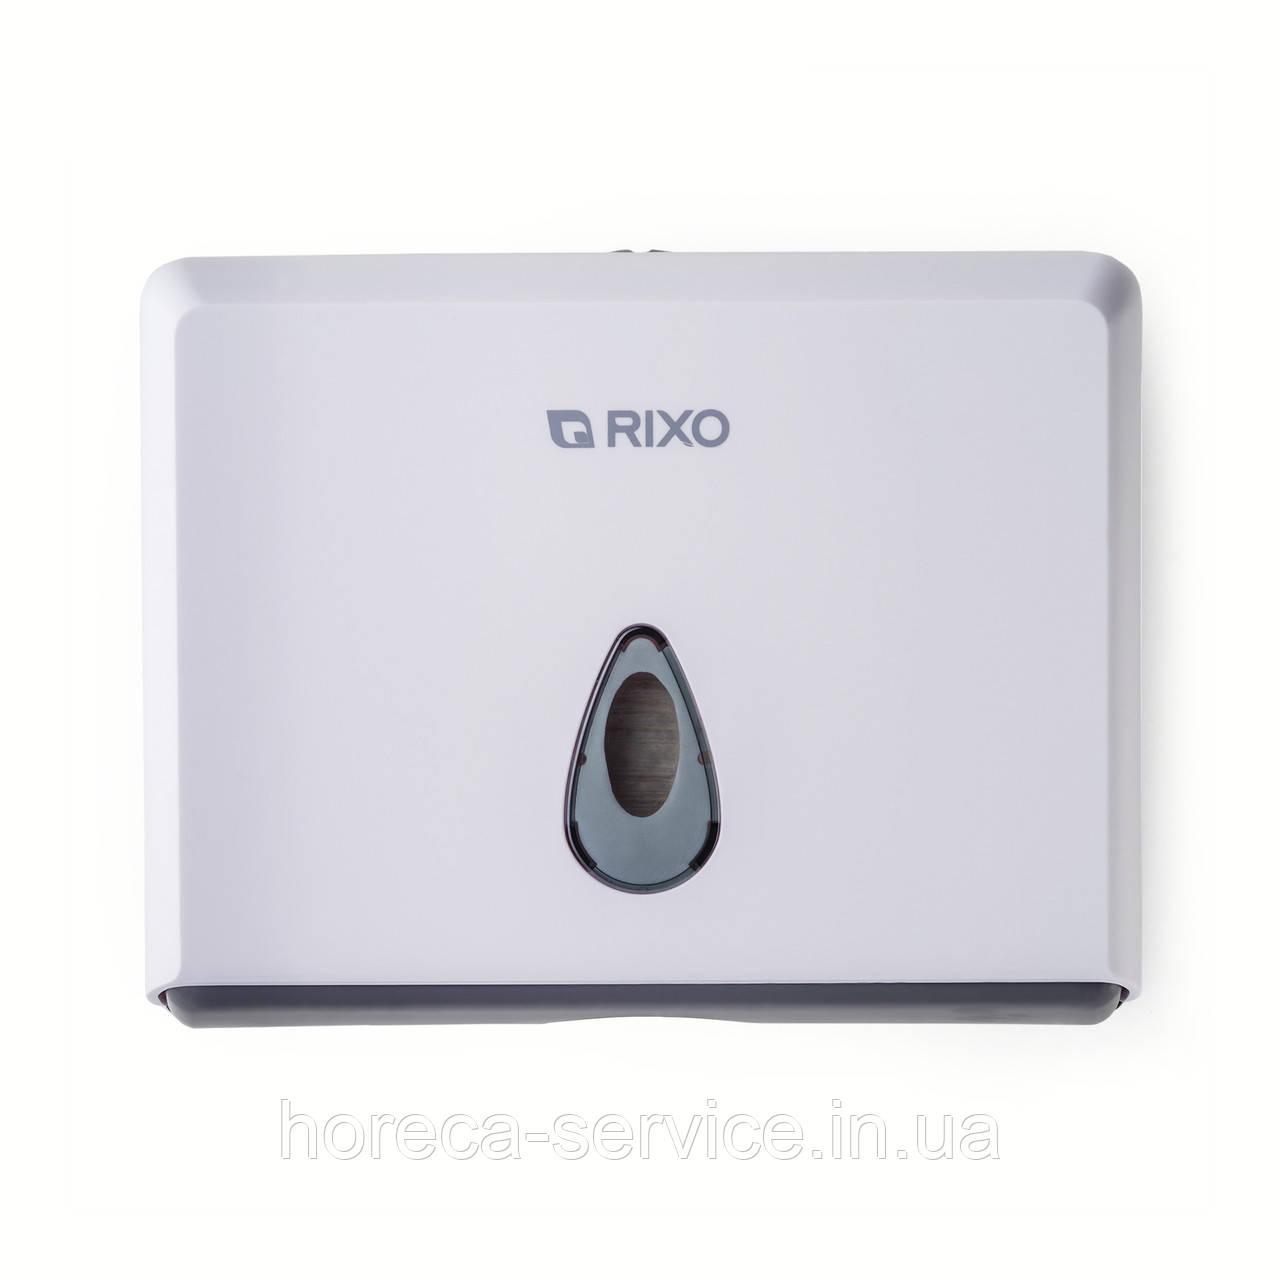 Диспенсер для бумажных полотенец Z/W-сложения Rixo Maggio P055W